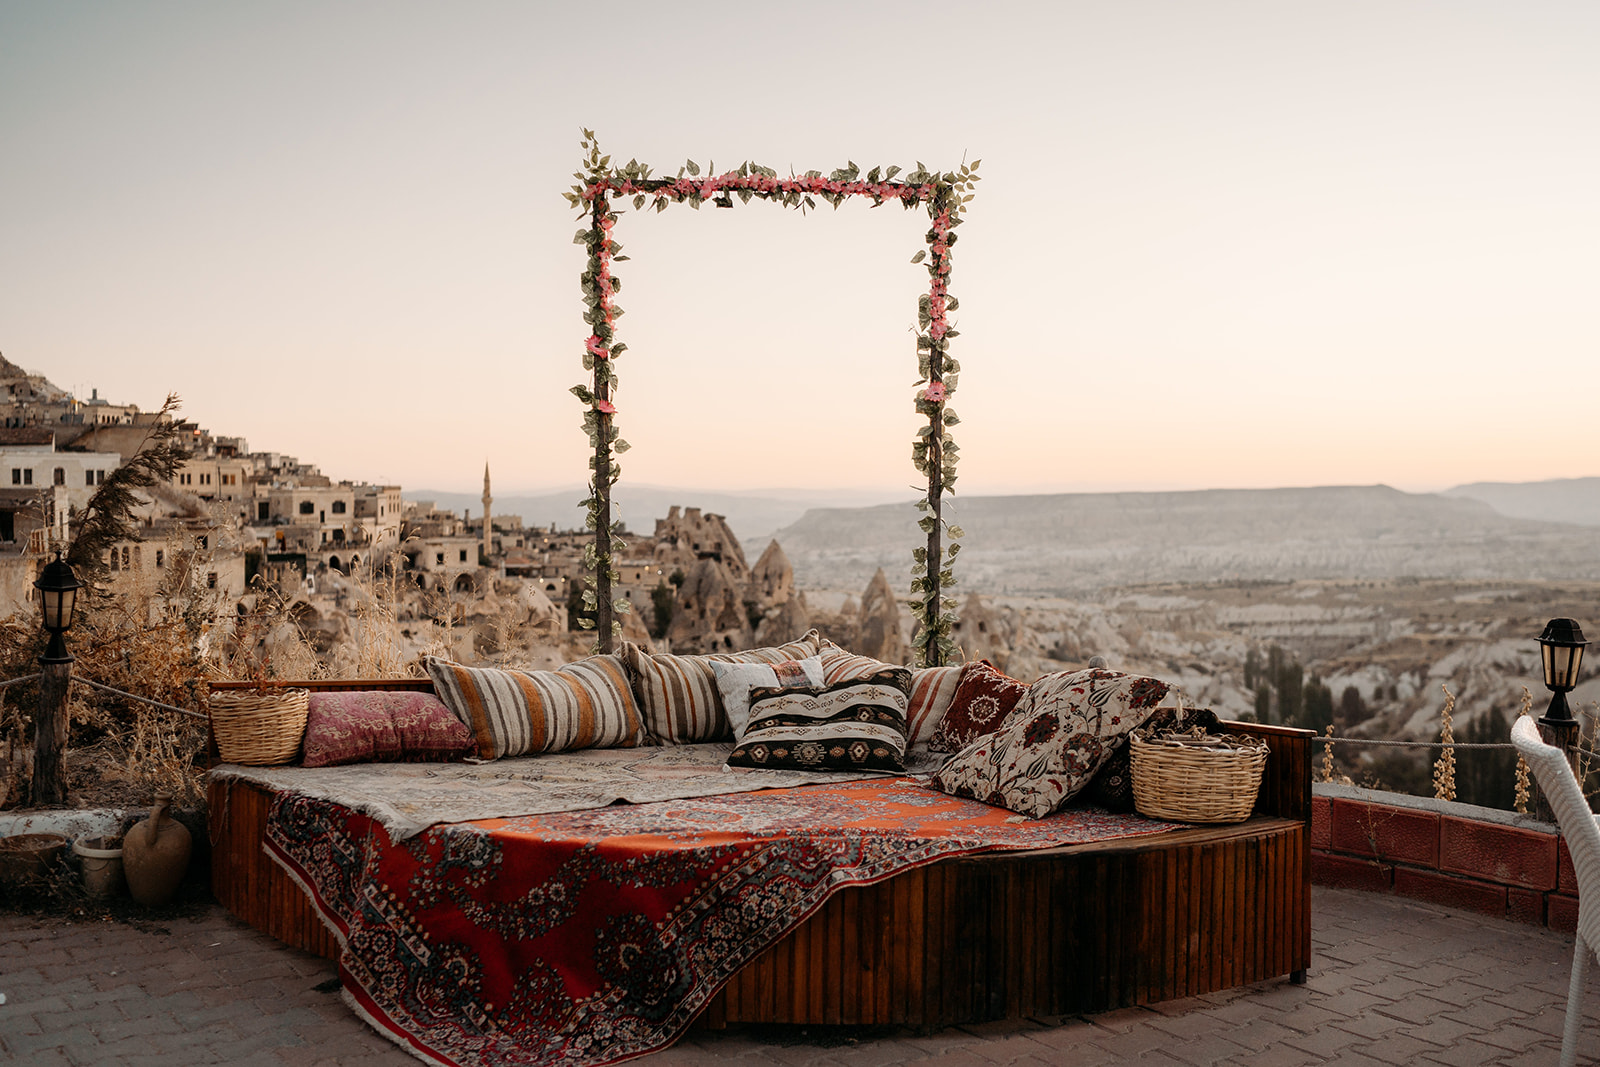 romantic elopement in cappadocia - Cappadocia wedding - beautiful elopement photography - Turkish elopement photoshoot - bohemian wedding inspiration